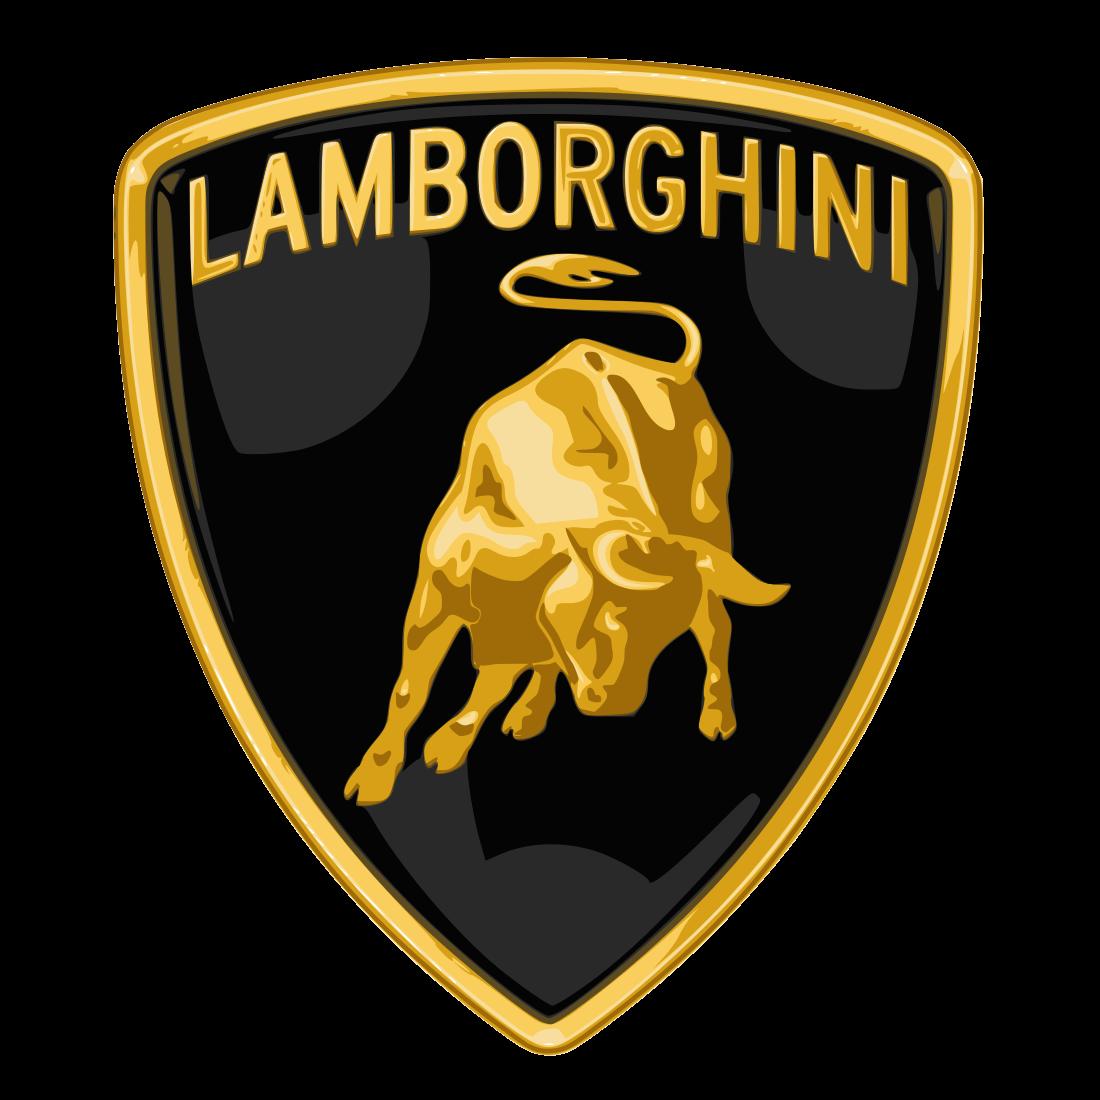 Lamborghini Logo, Lamborghini Car Symbol Meaning and History.